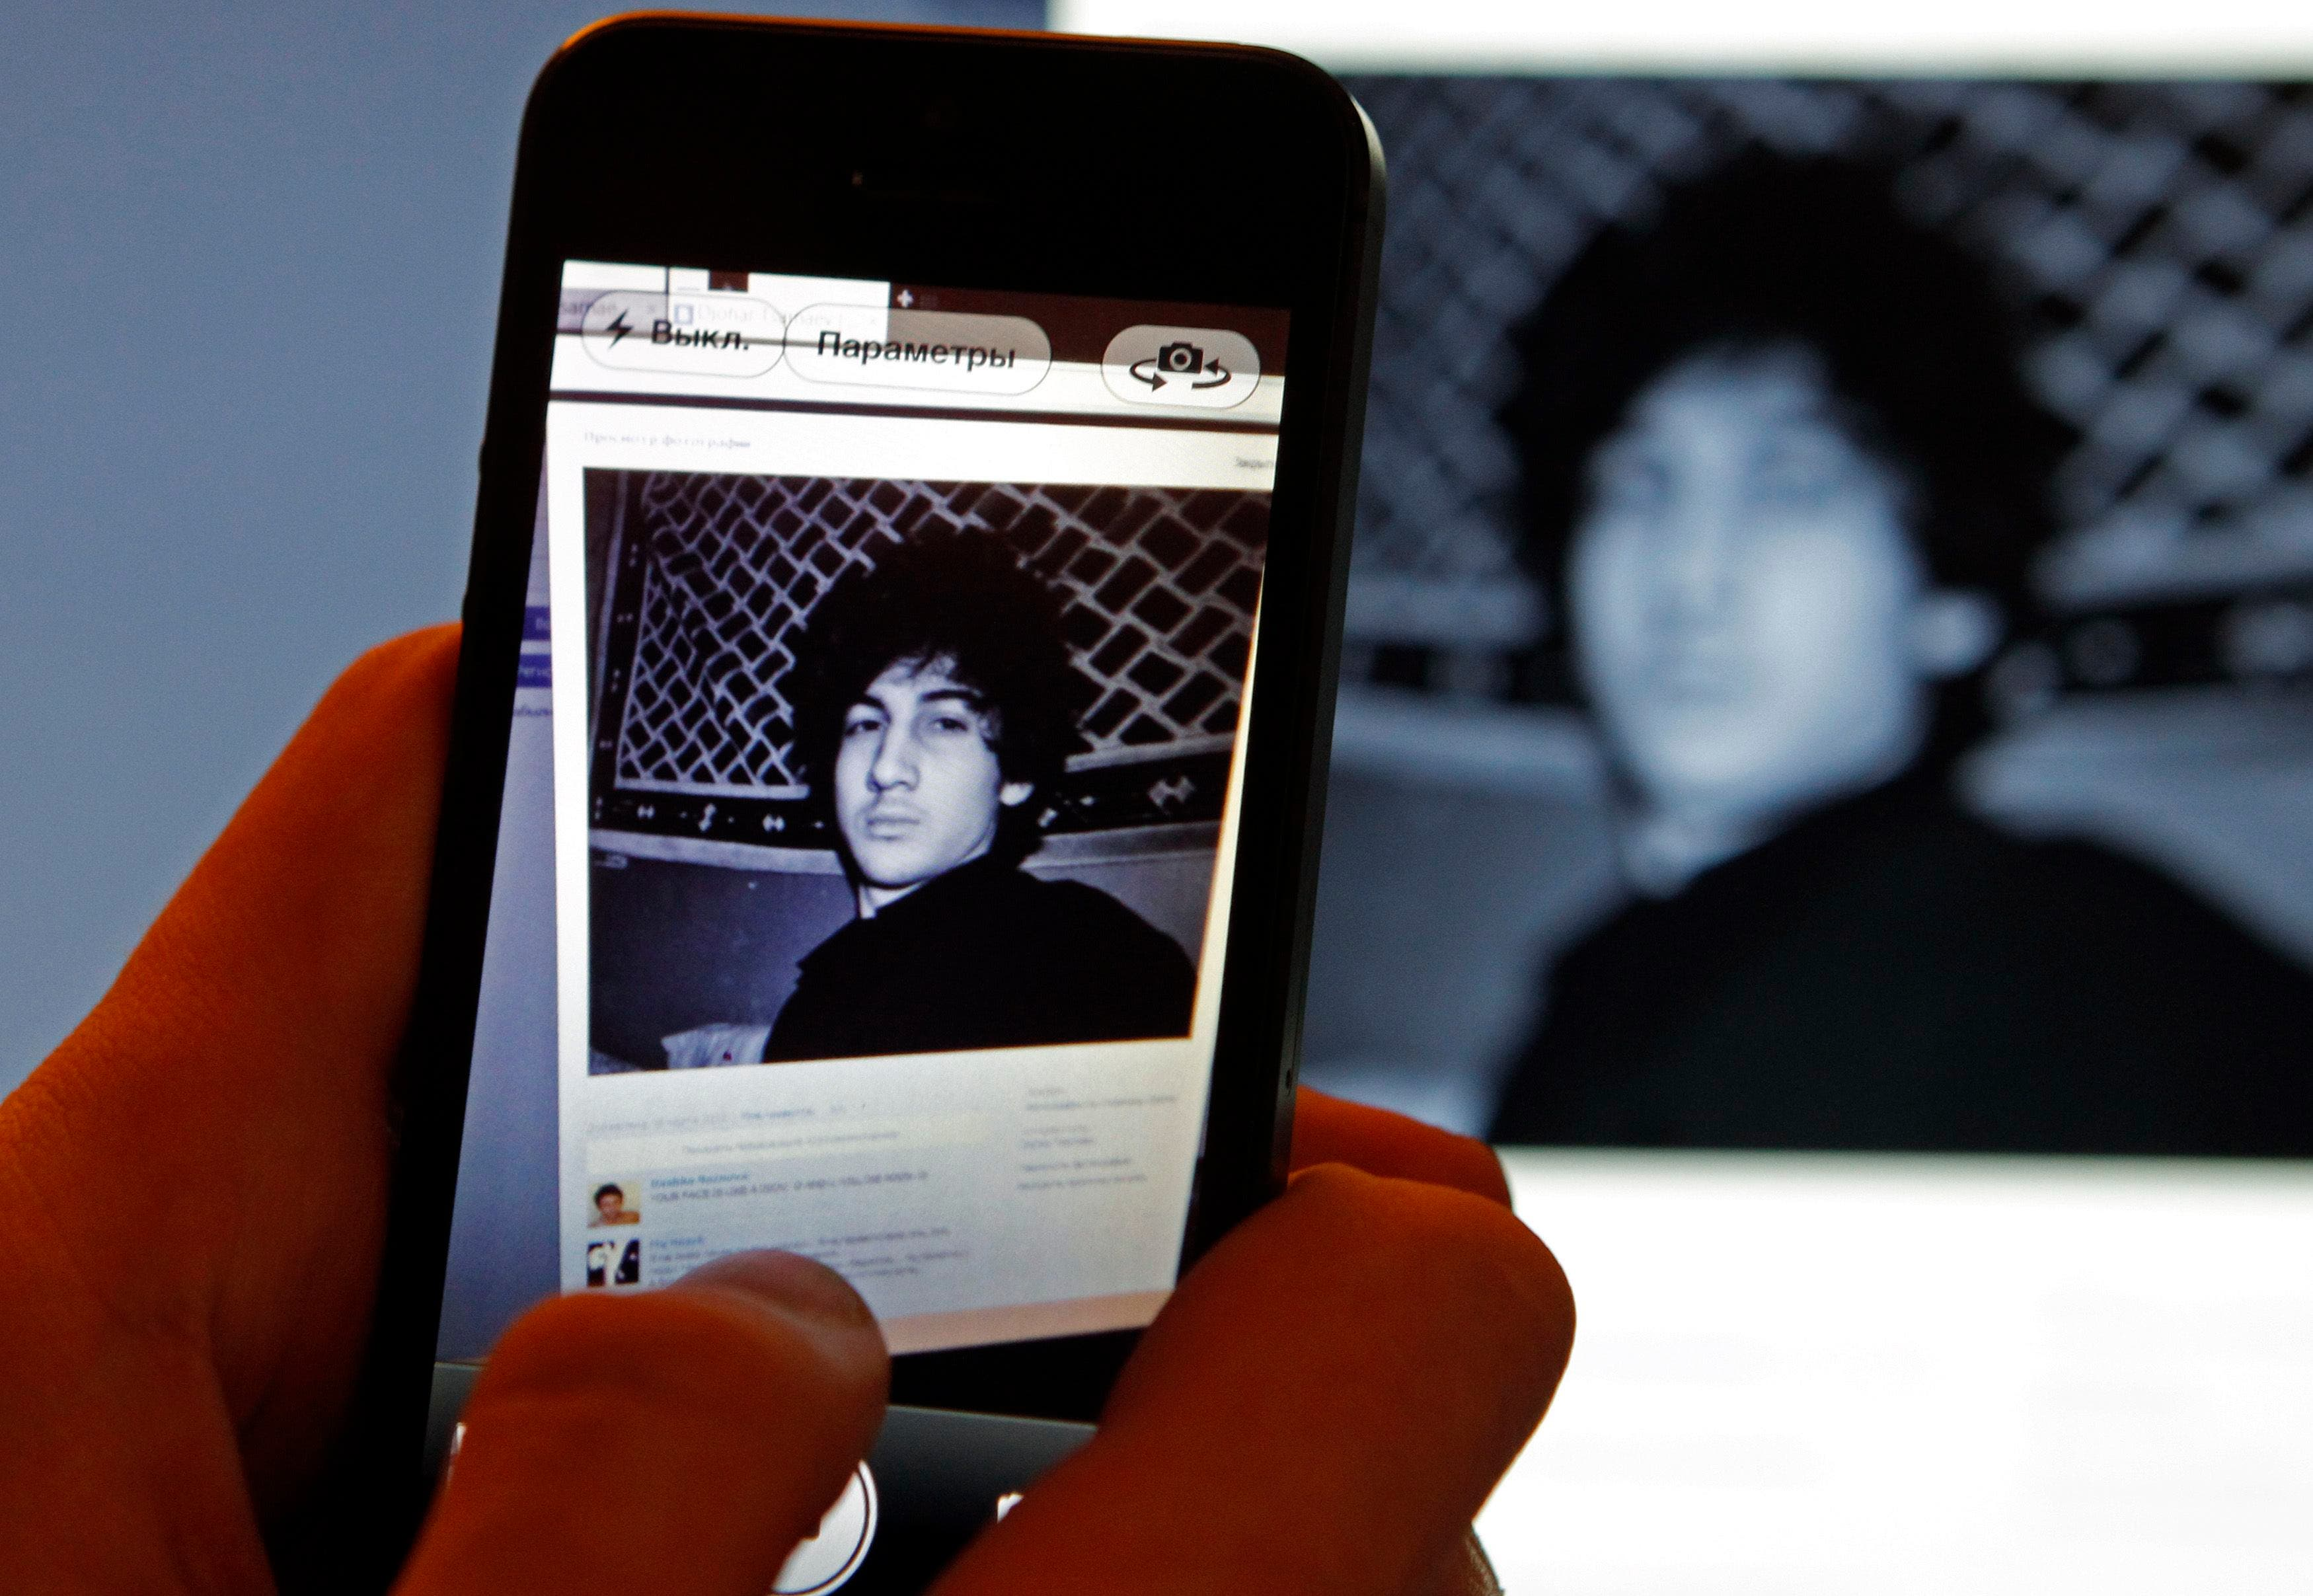 A photograph of Djohar Tsarnaev, who is believed to be Dzhokhar Tsarnaev, a suspect in the Boston Marathon bombing (Reuters)